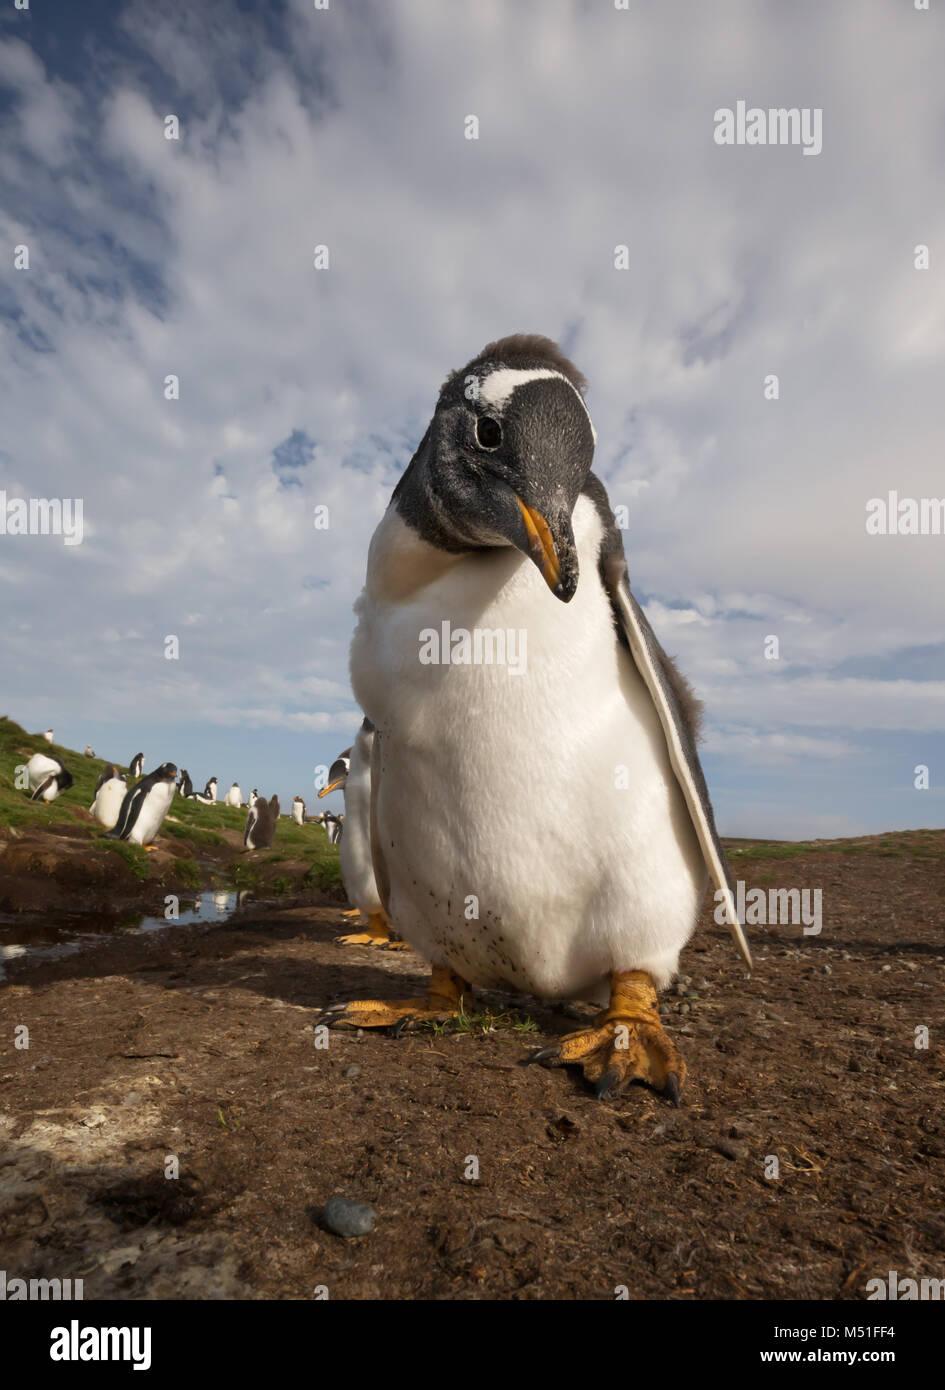 Cerca de pingüinos papúa (Pygoscelis papua) chick, Islas Malvinas. Imagen De Stock